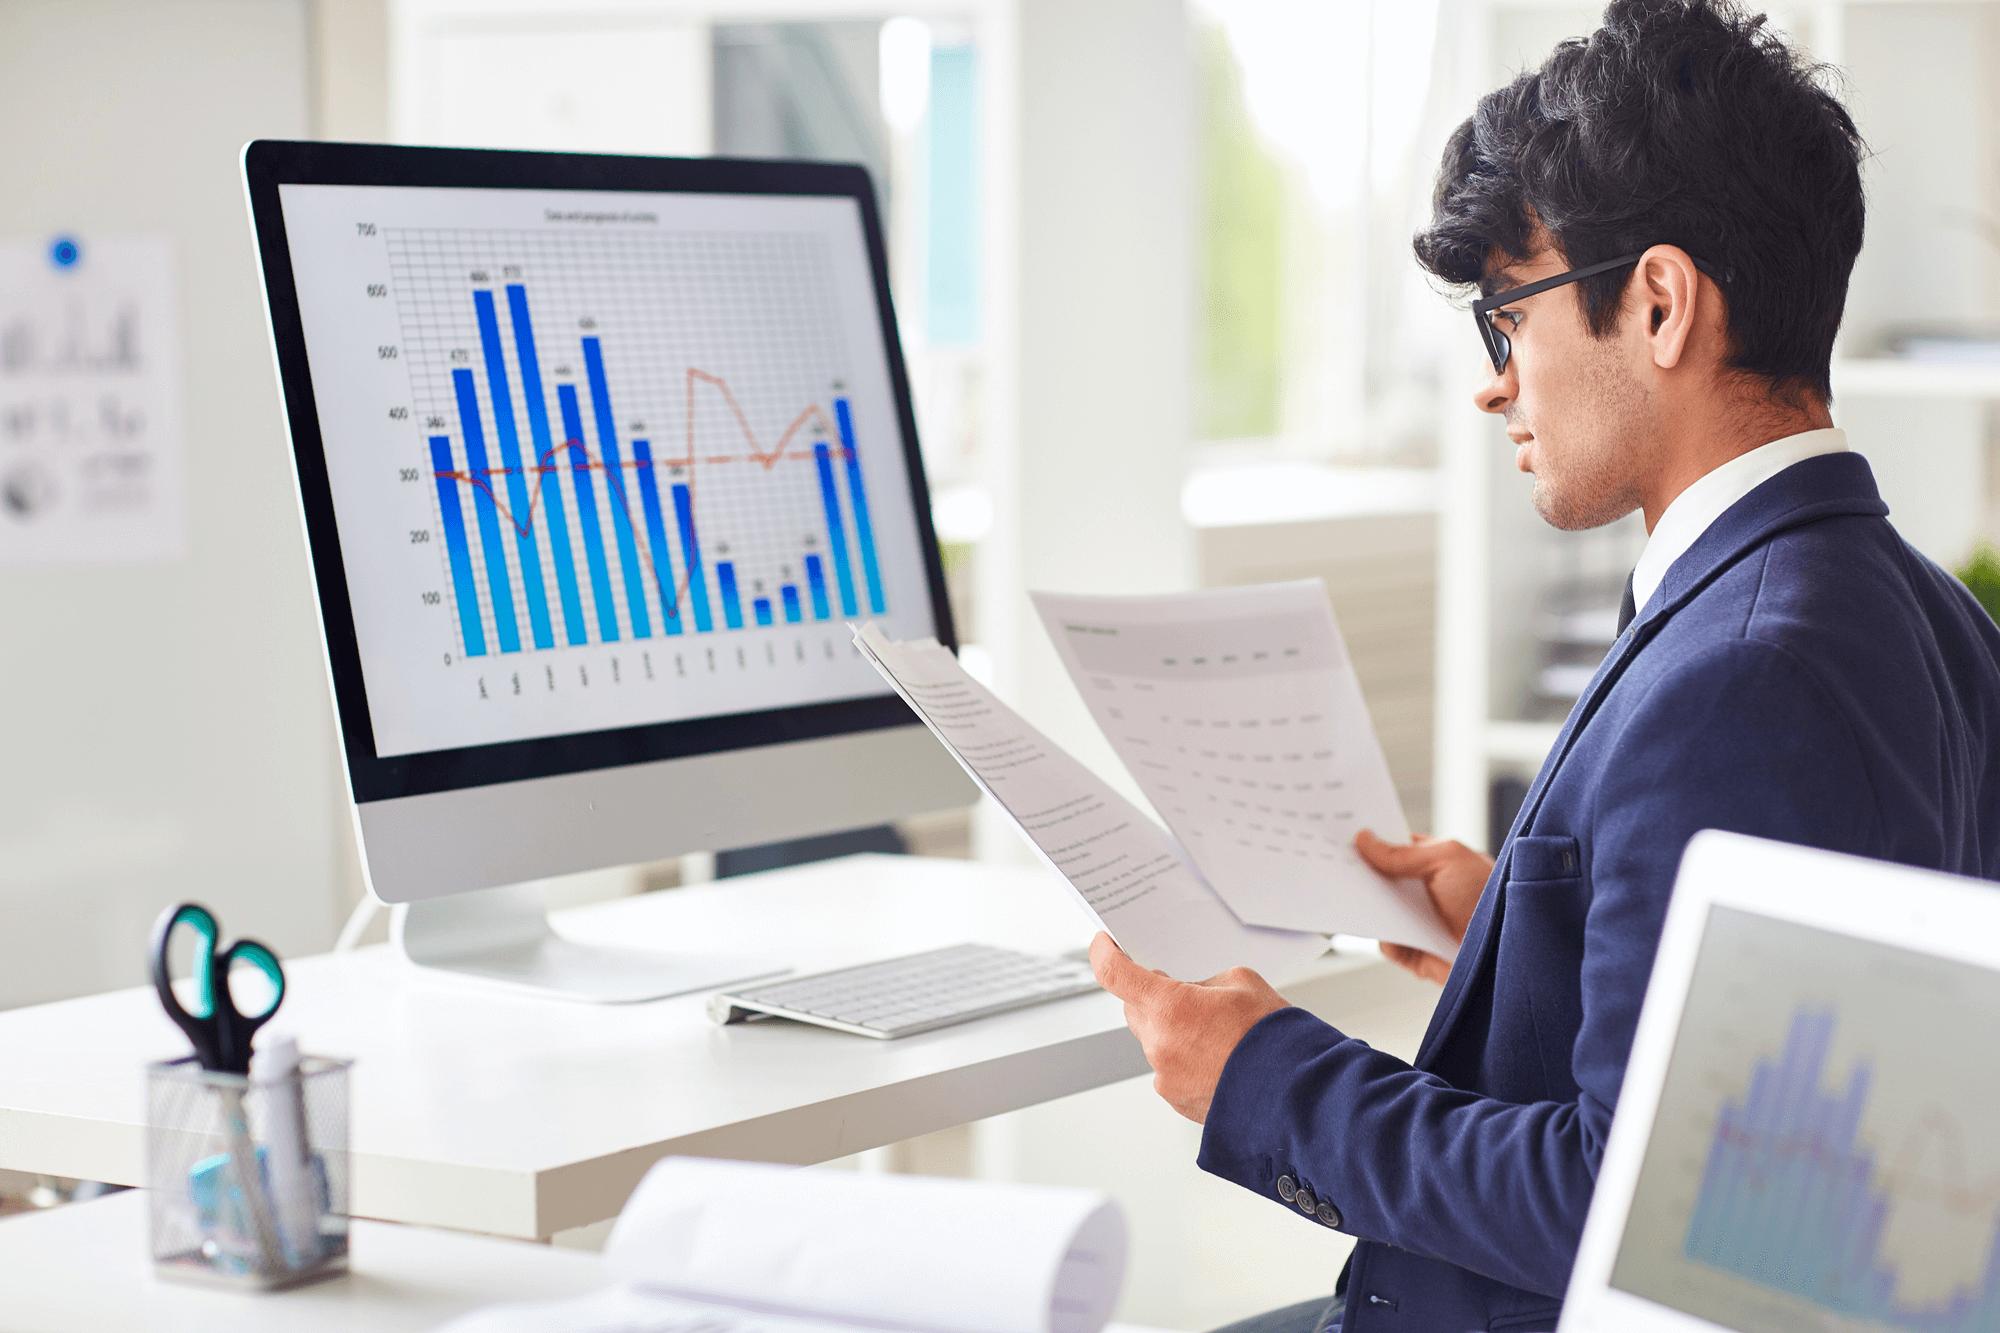 Controllers & Big Data | Een perfecte, innovatieve match